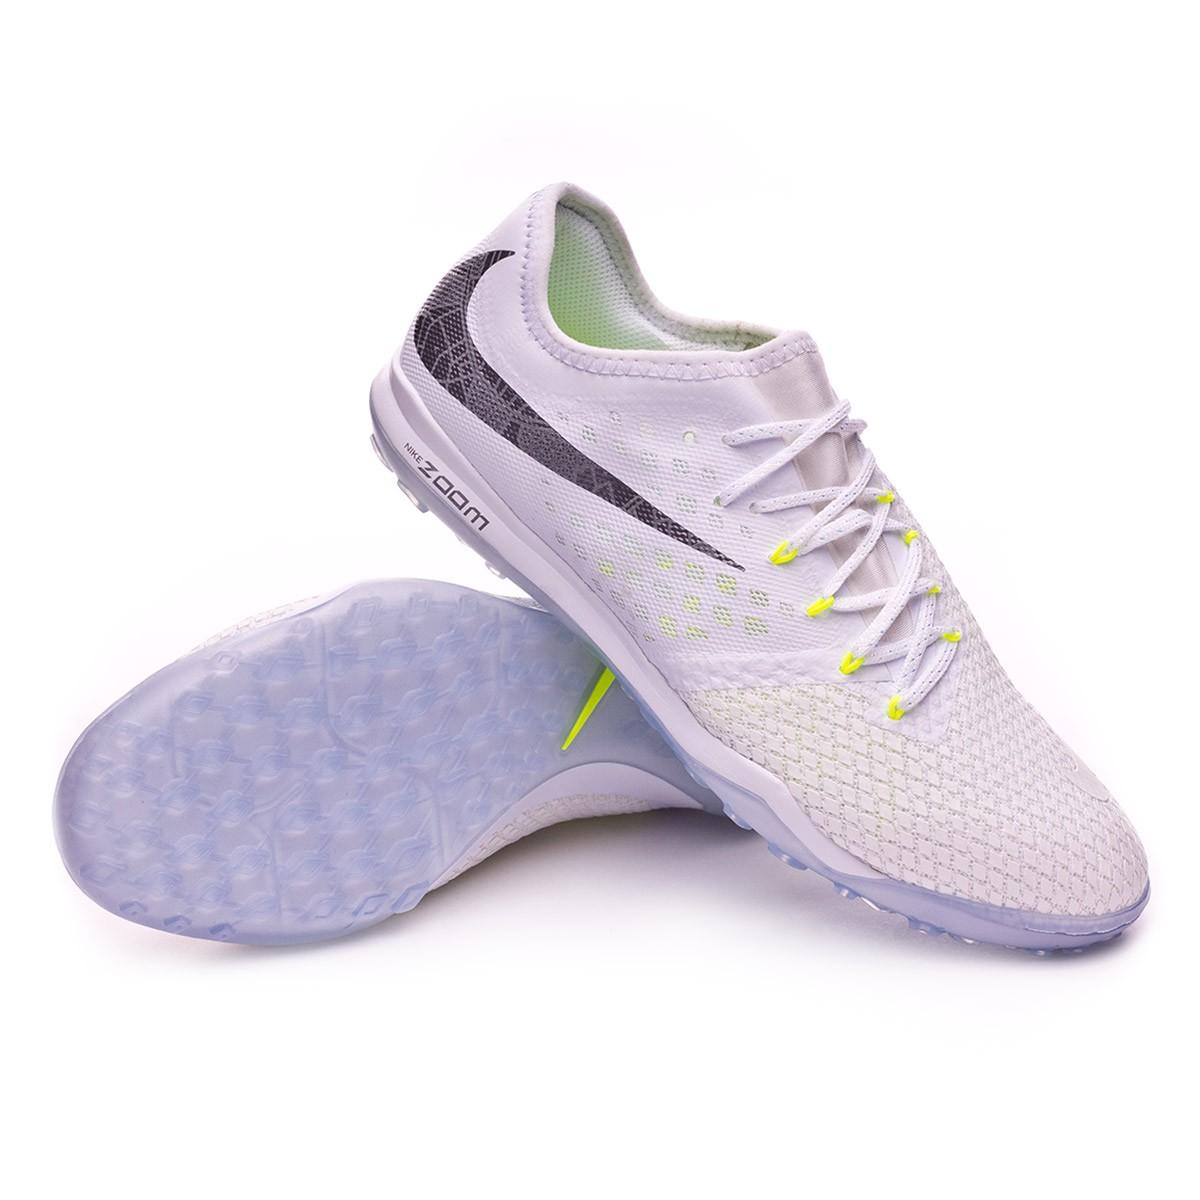 Envolver Despertar adoptar  Football Boot Nike Hypervenom Zoom PhantomX III Pro Turf White-Metallic  cool grey-Volt-Metallic cool g - Football store Fútbol Emotion